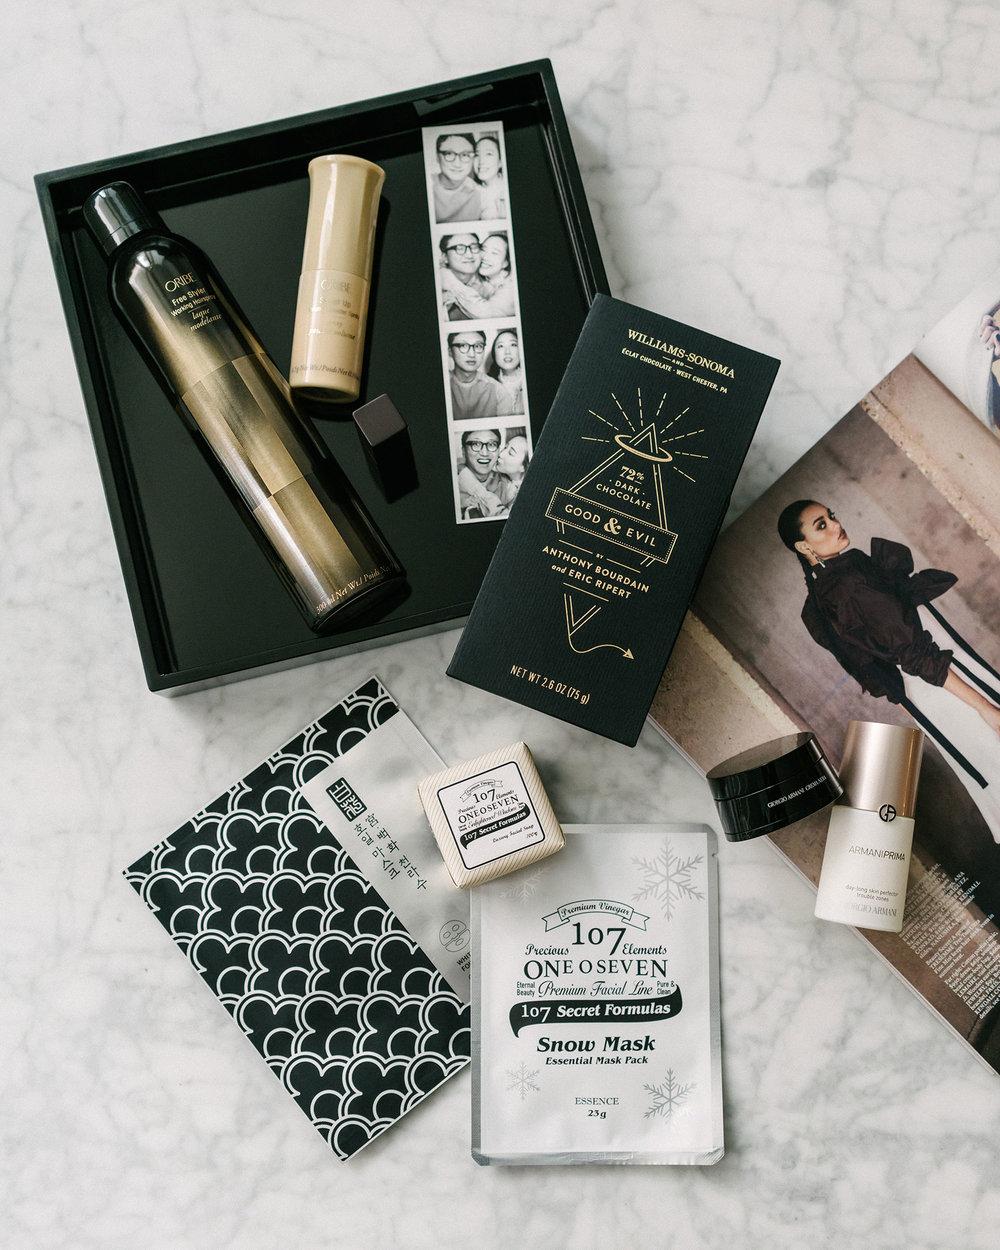 Oribe Hairspray  and  Dry Shampoo ,  One o Seven Sheet Masks ,  Armani Beauty Eye Cream  and  Primer